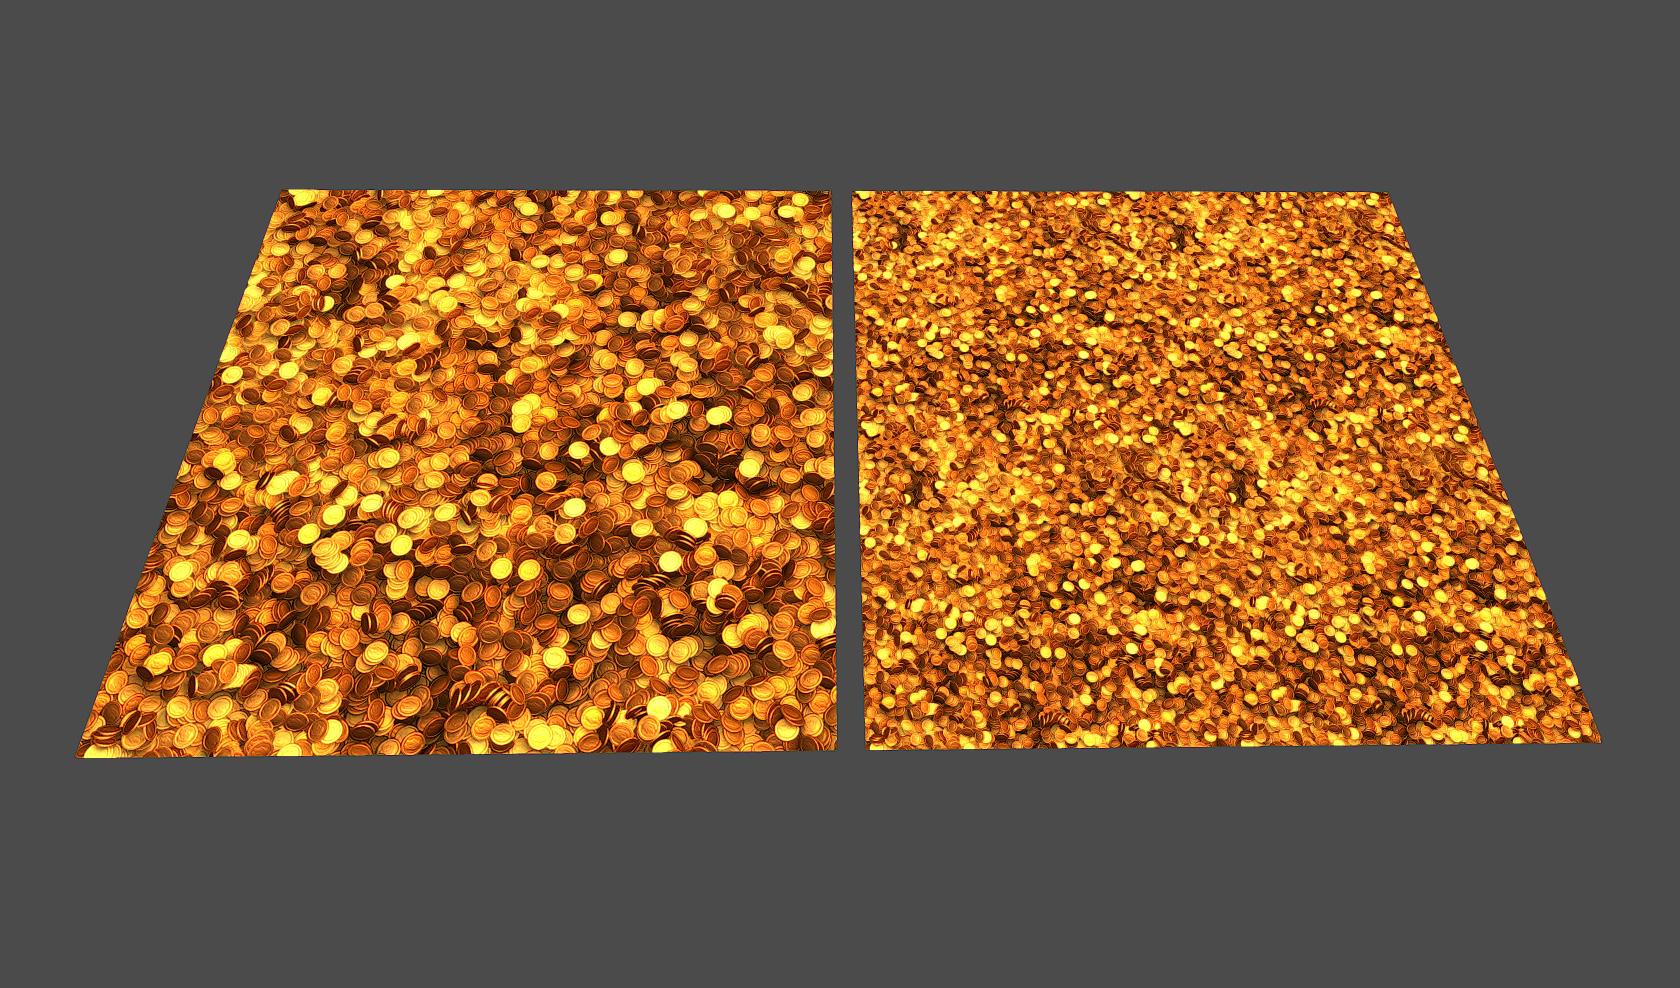 20120824_gold_coins_render.jpg